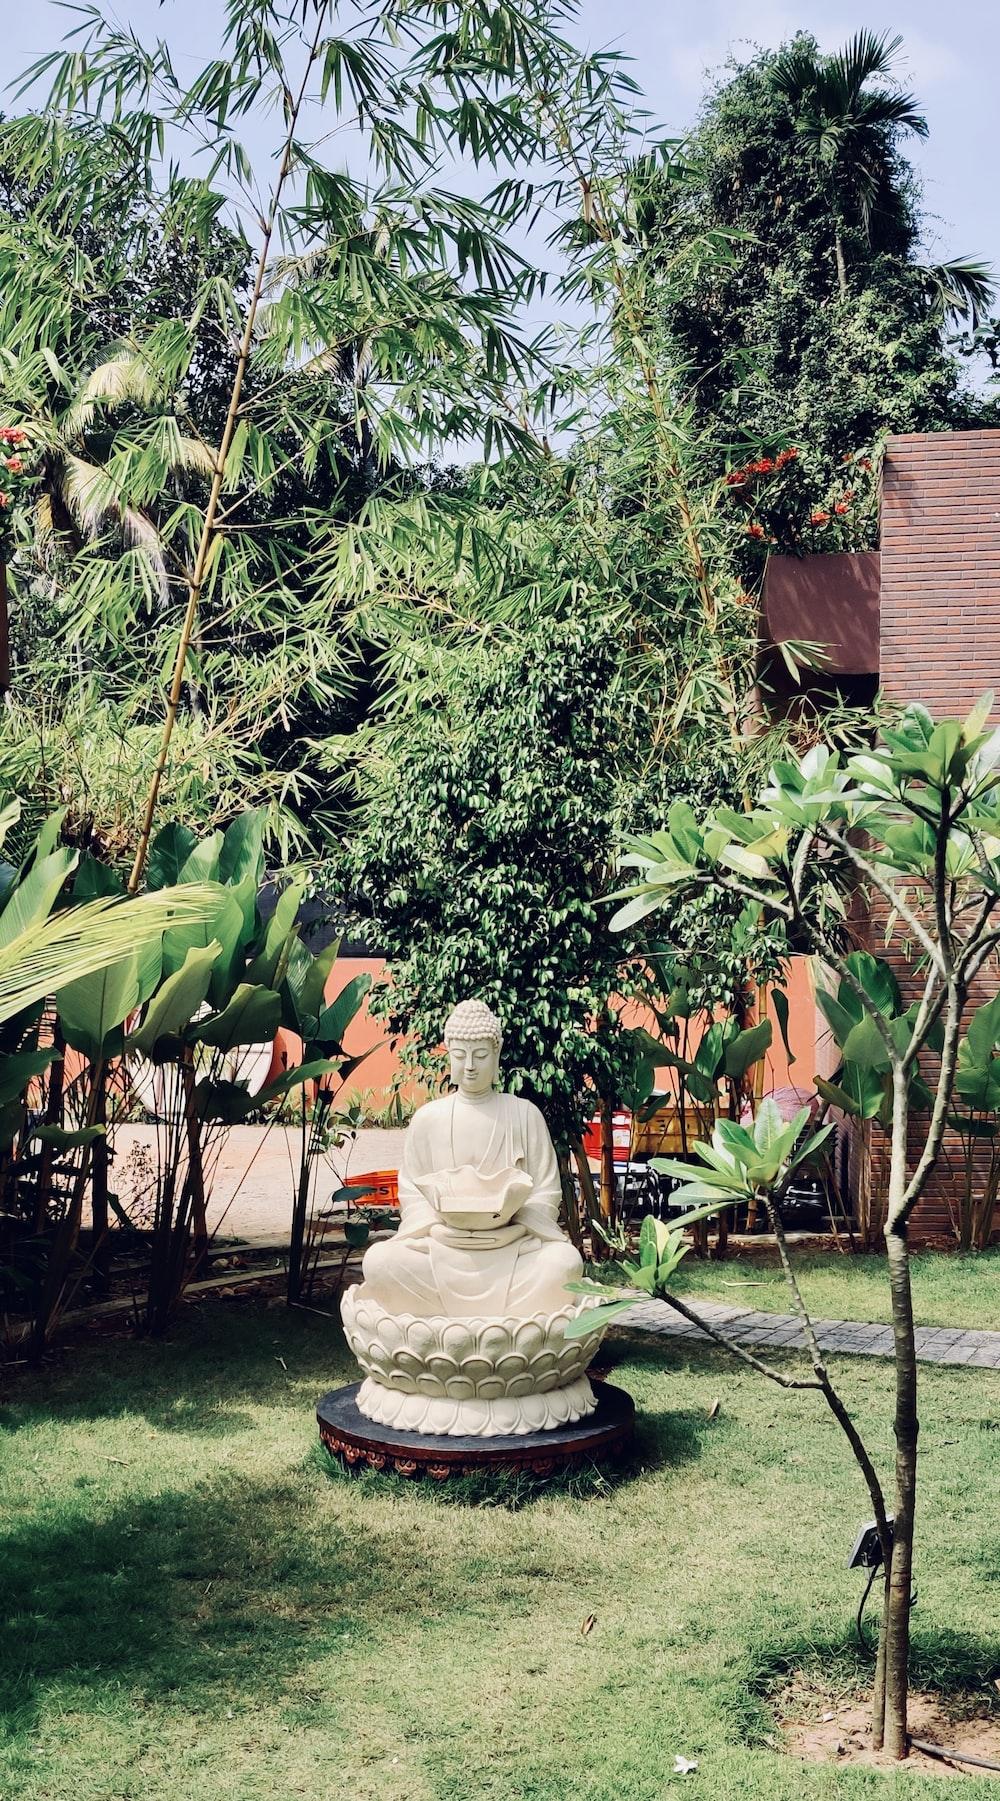 white ceramic statue near green tree during daytime